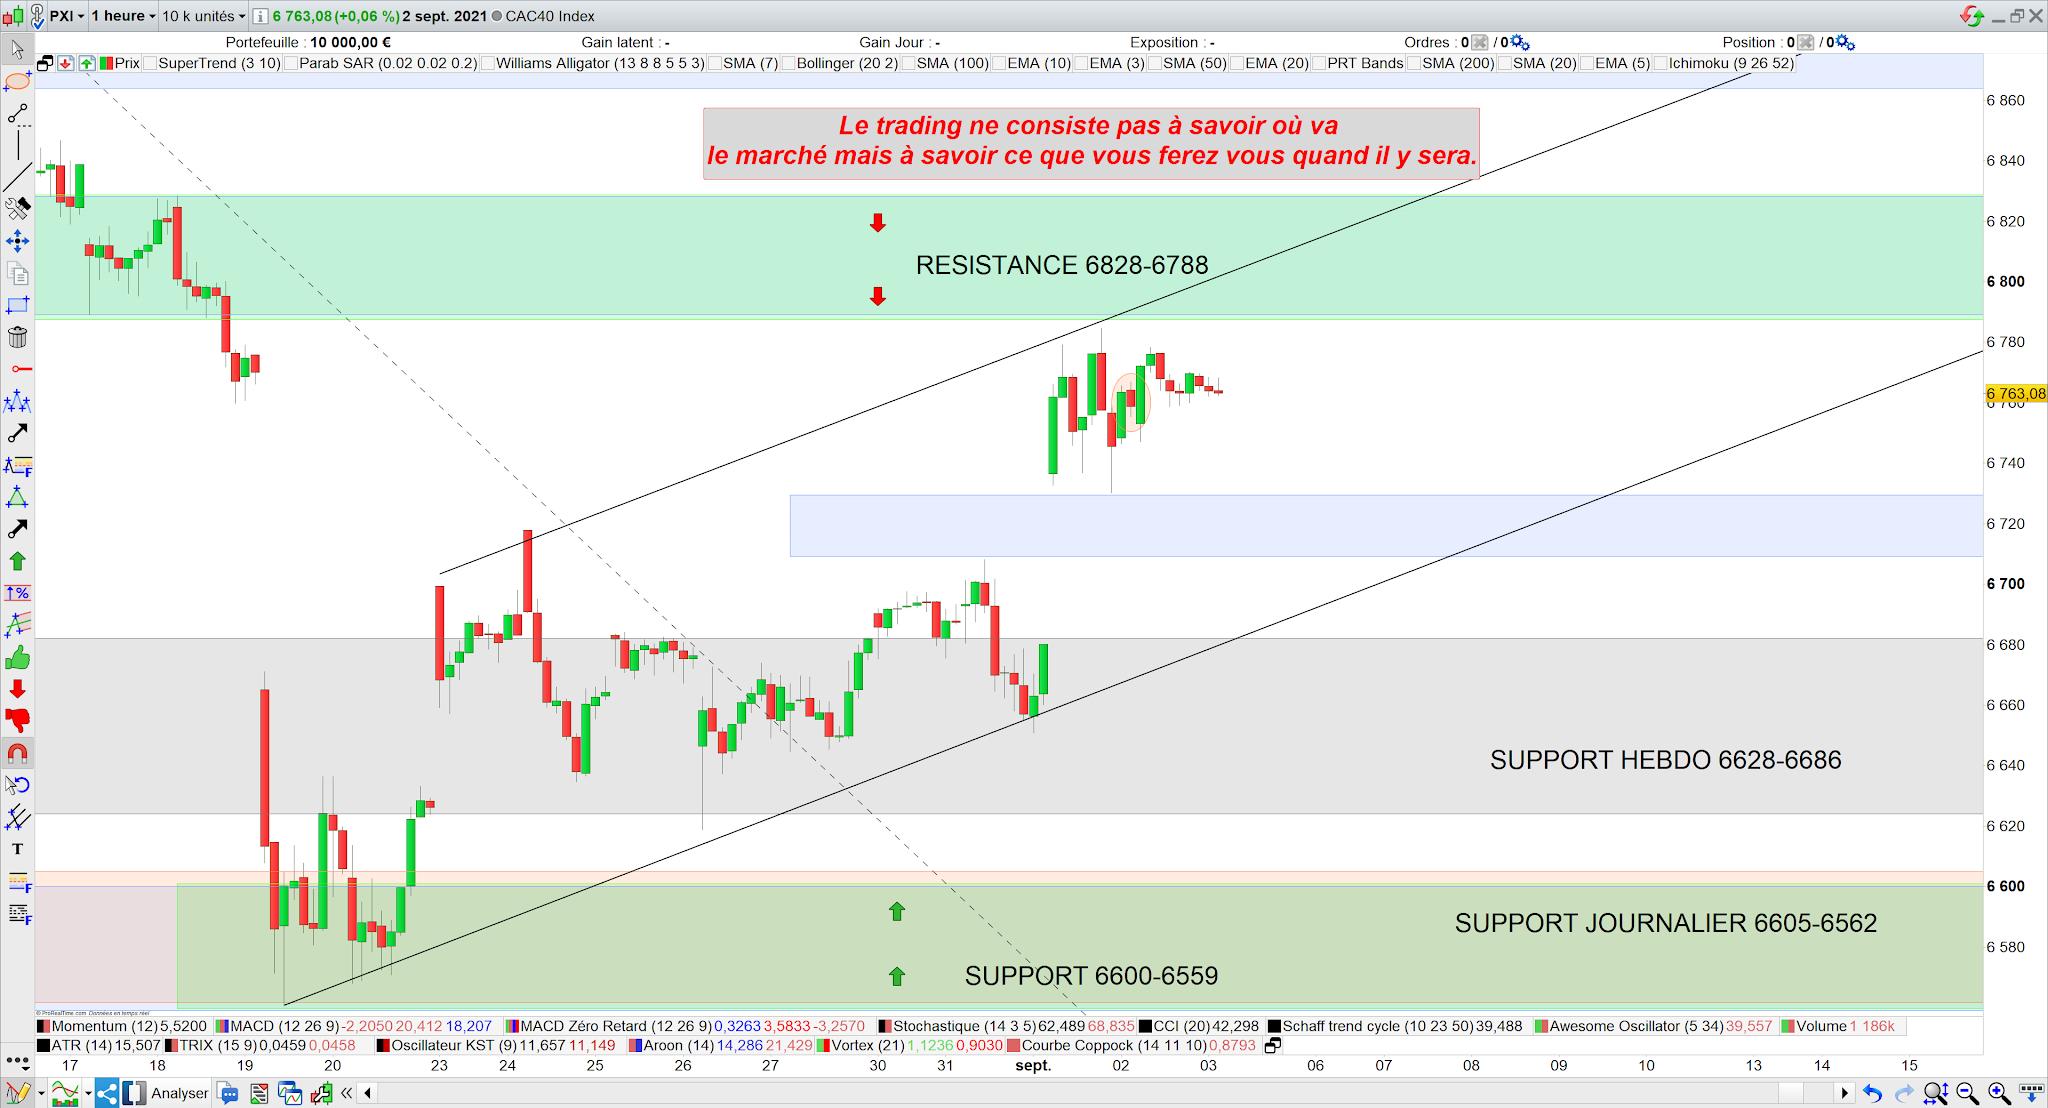 Bilan trading cac40 03/09/21